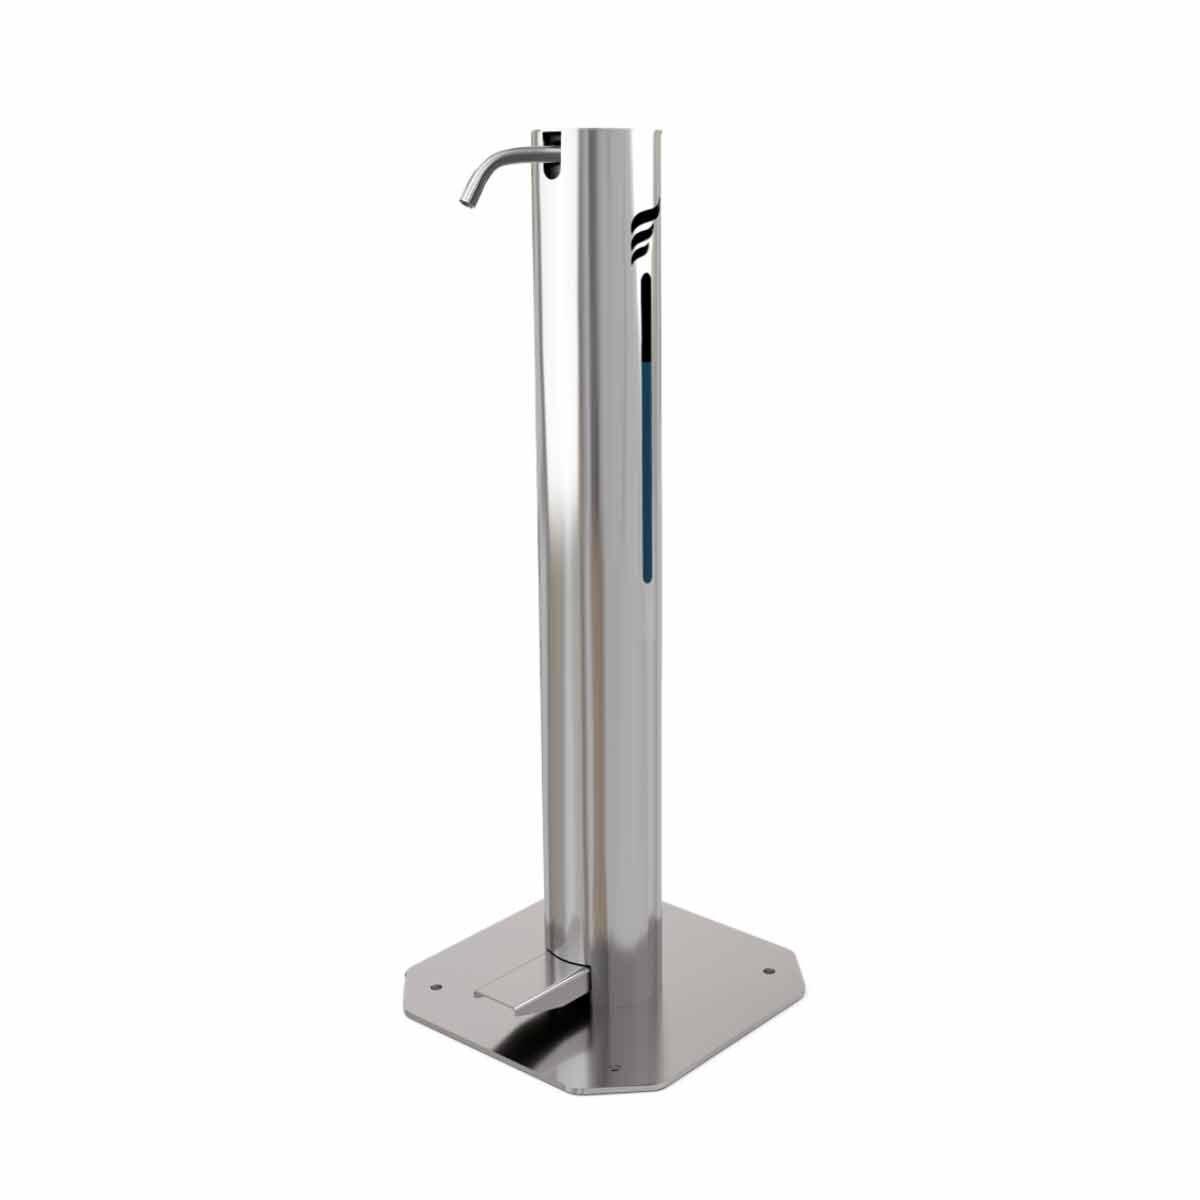 Astreea Foot Operated Sanitiser Dispenser Small